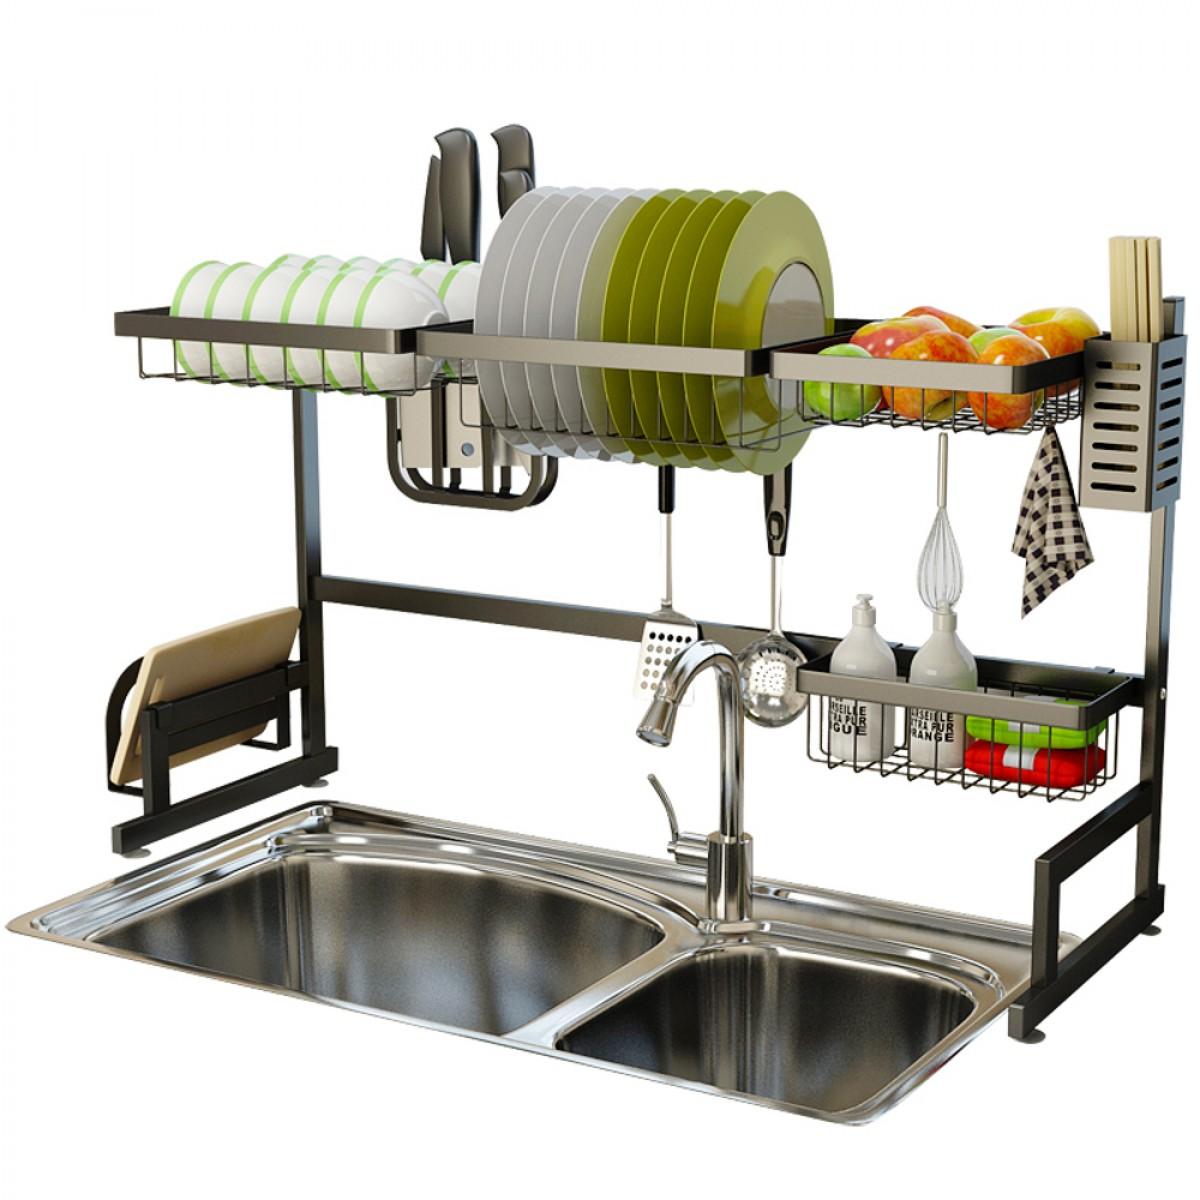 stainless steel black dish drying rack